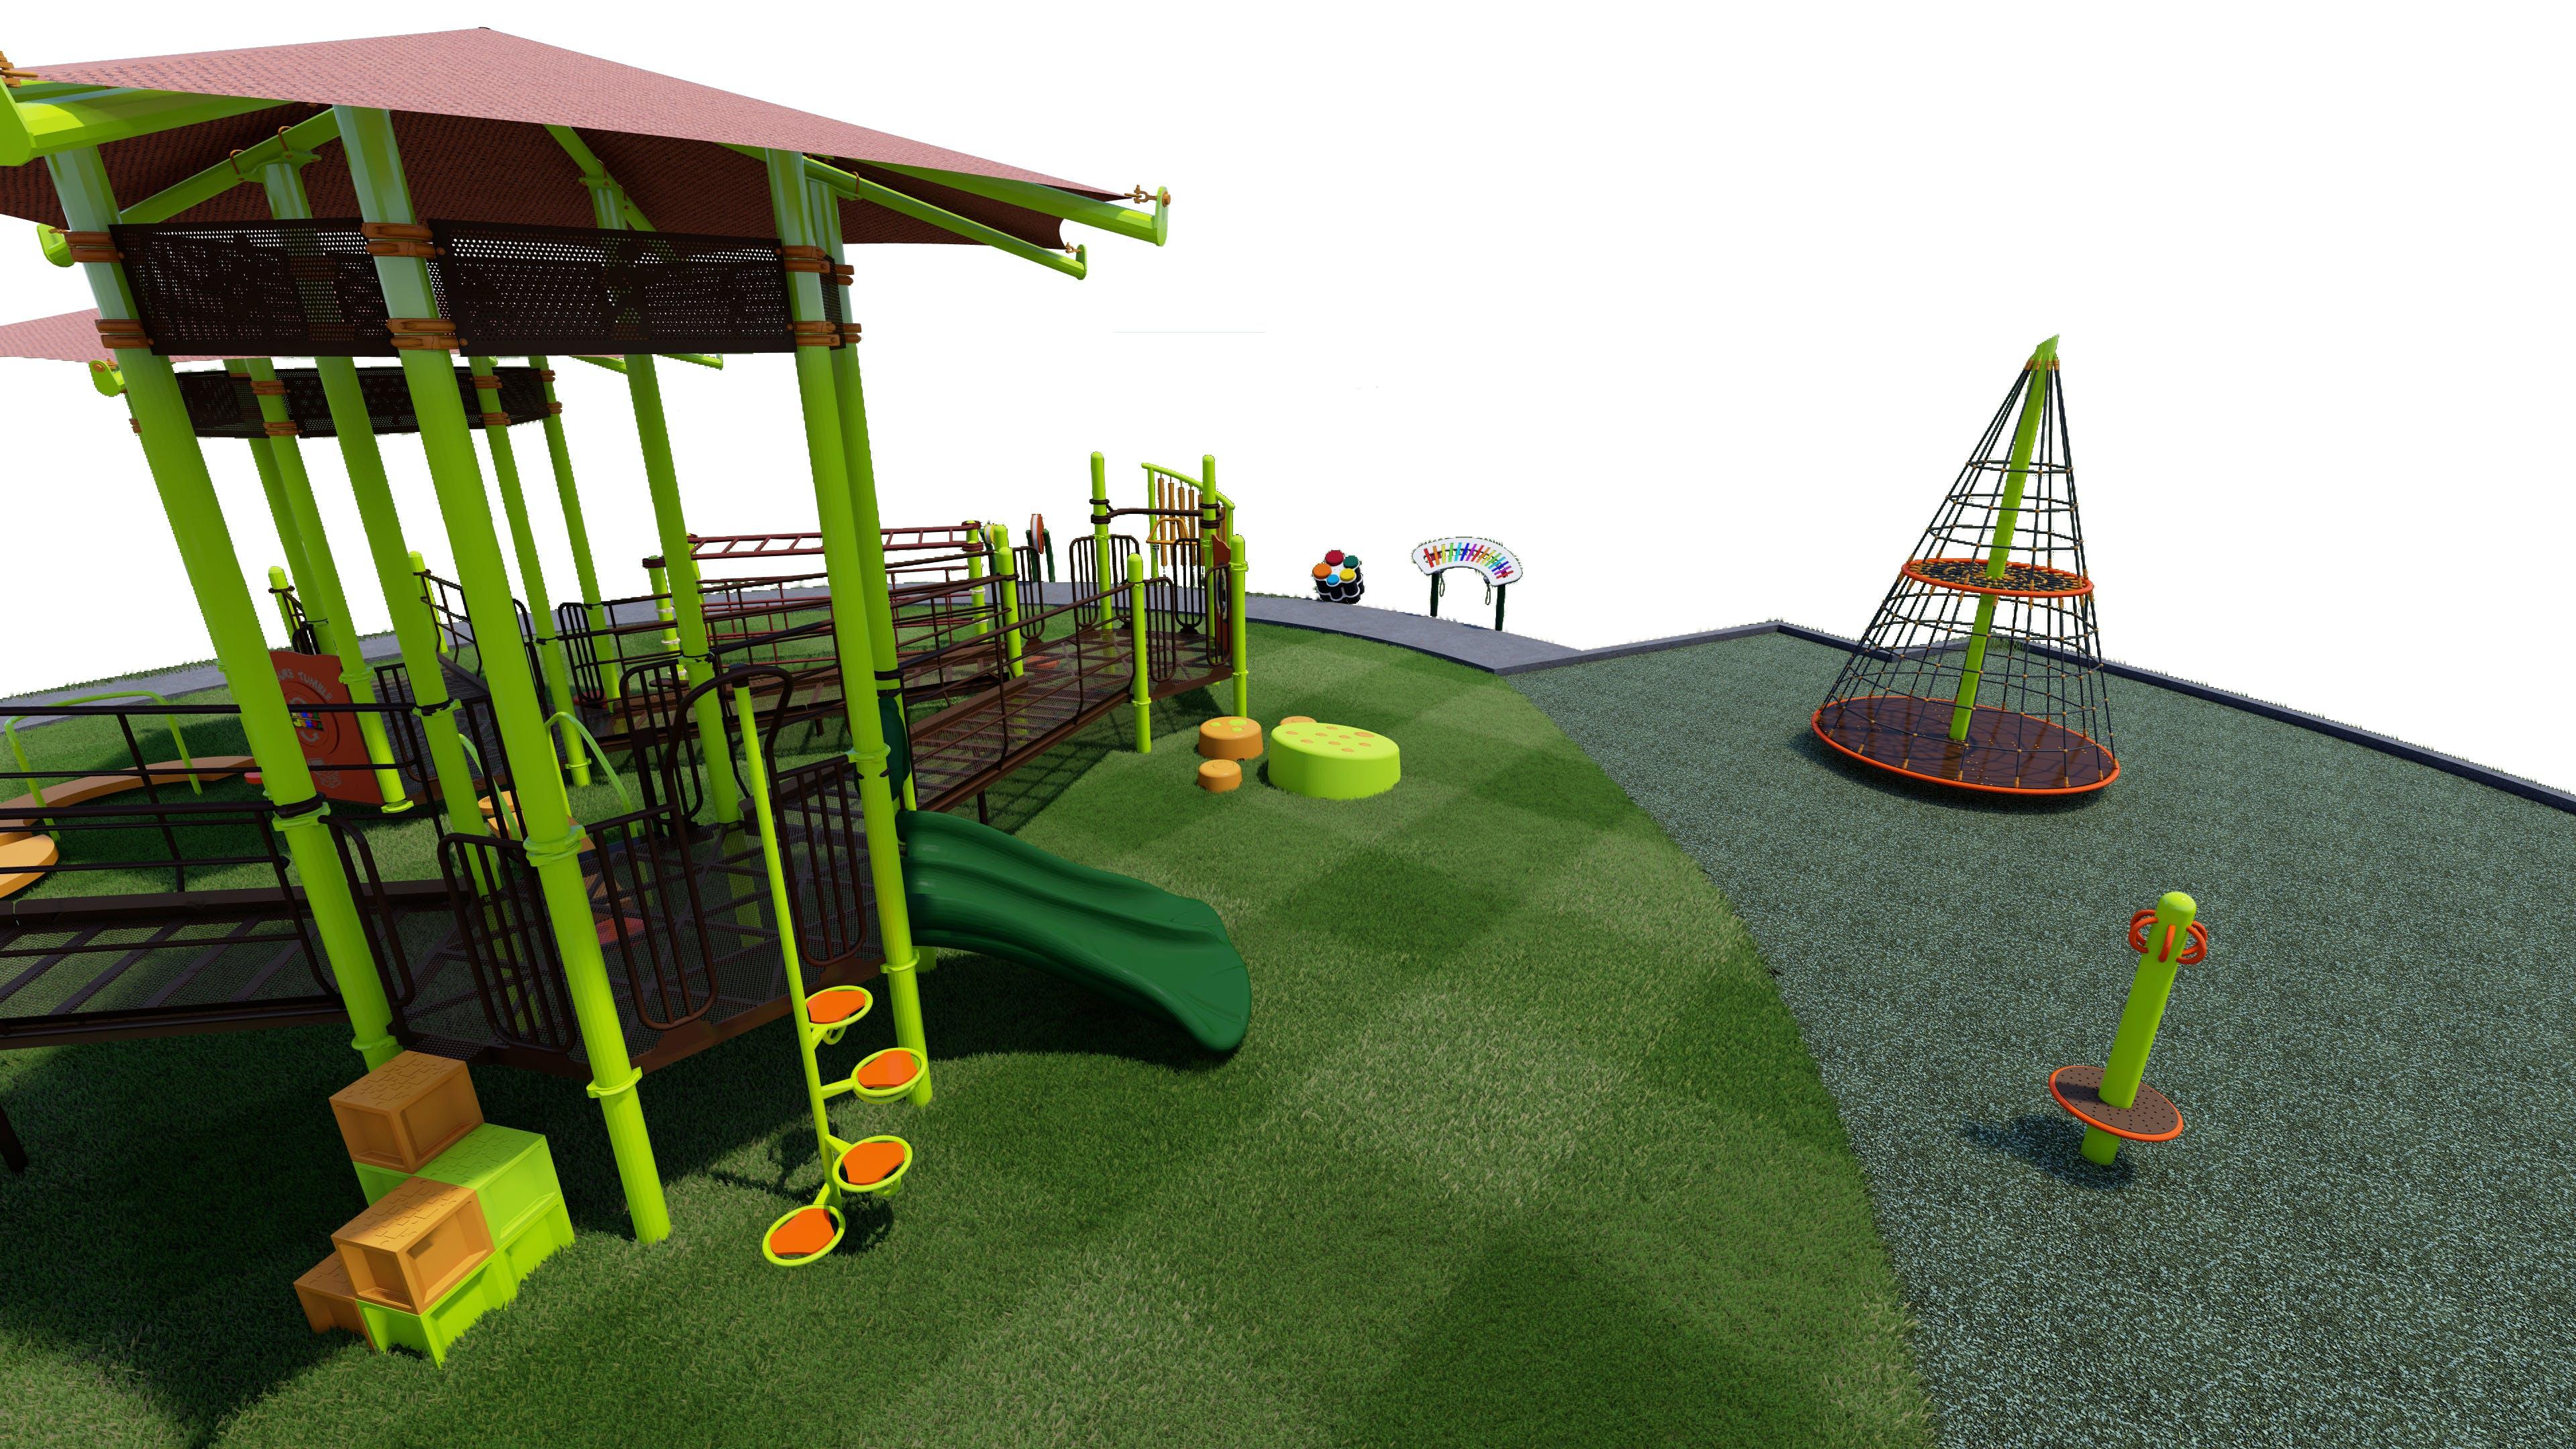 Preferred Playground Design View 4